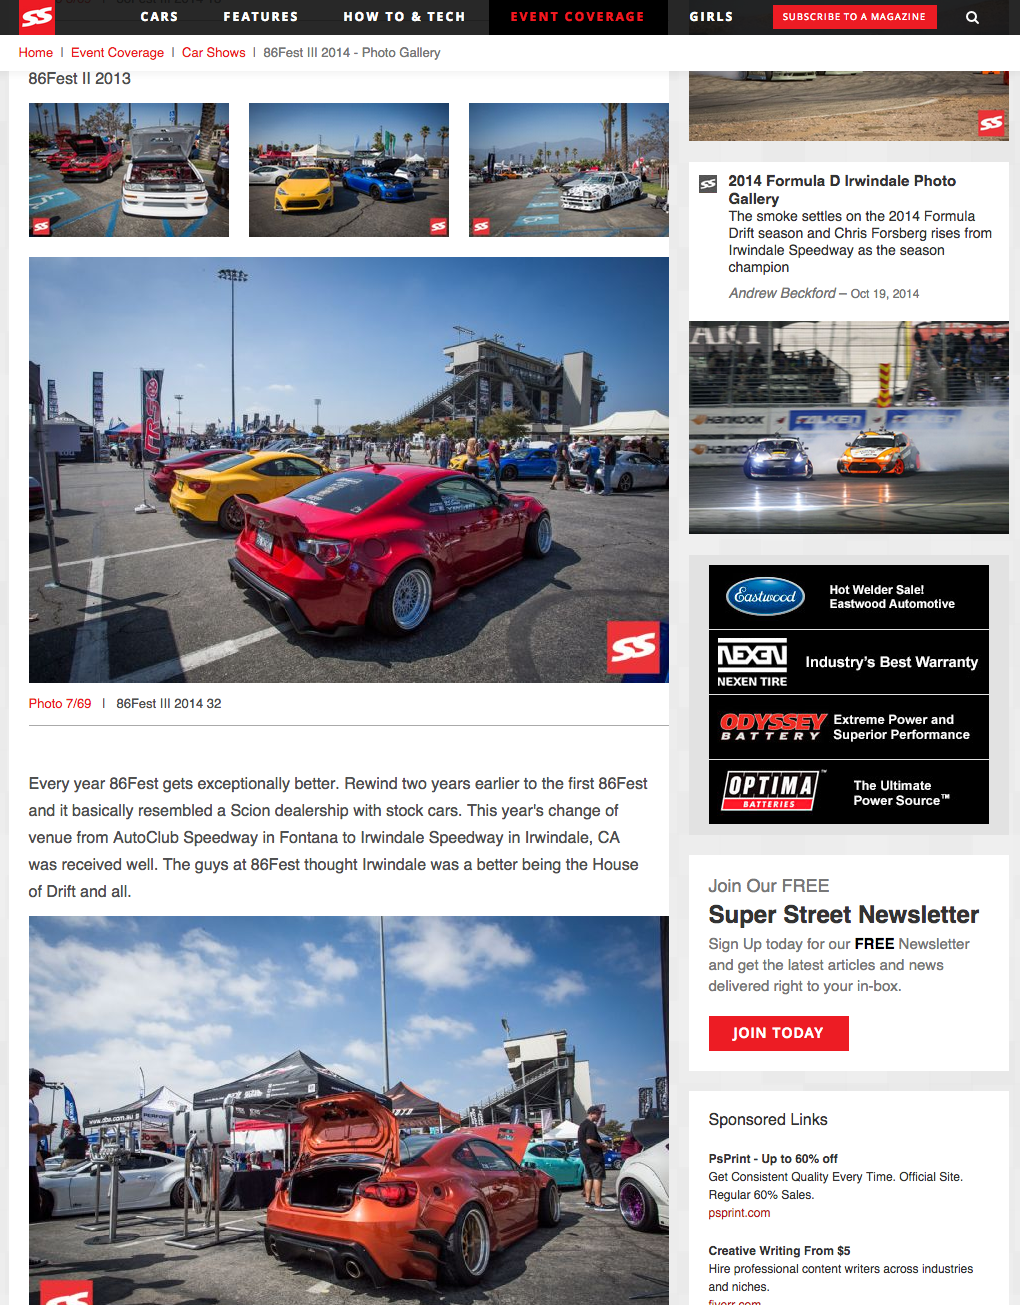 Super Street, 86FEST, Irwindale Speedway, Turn14, Turn 14, Scion FRS, FRS, BRZ, AE86